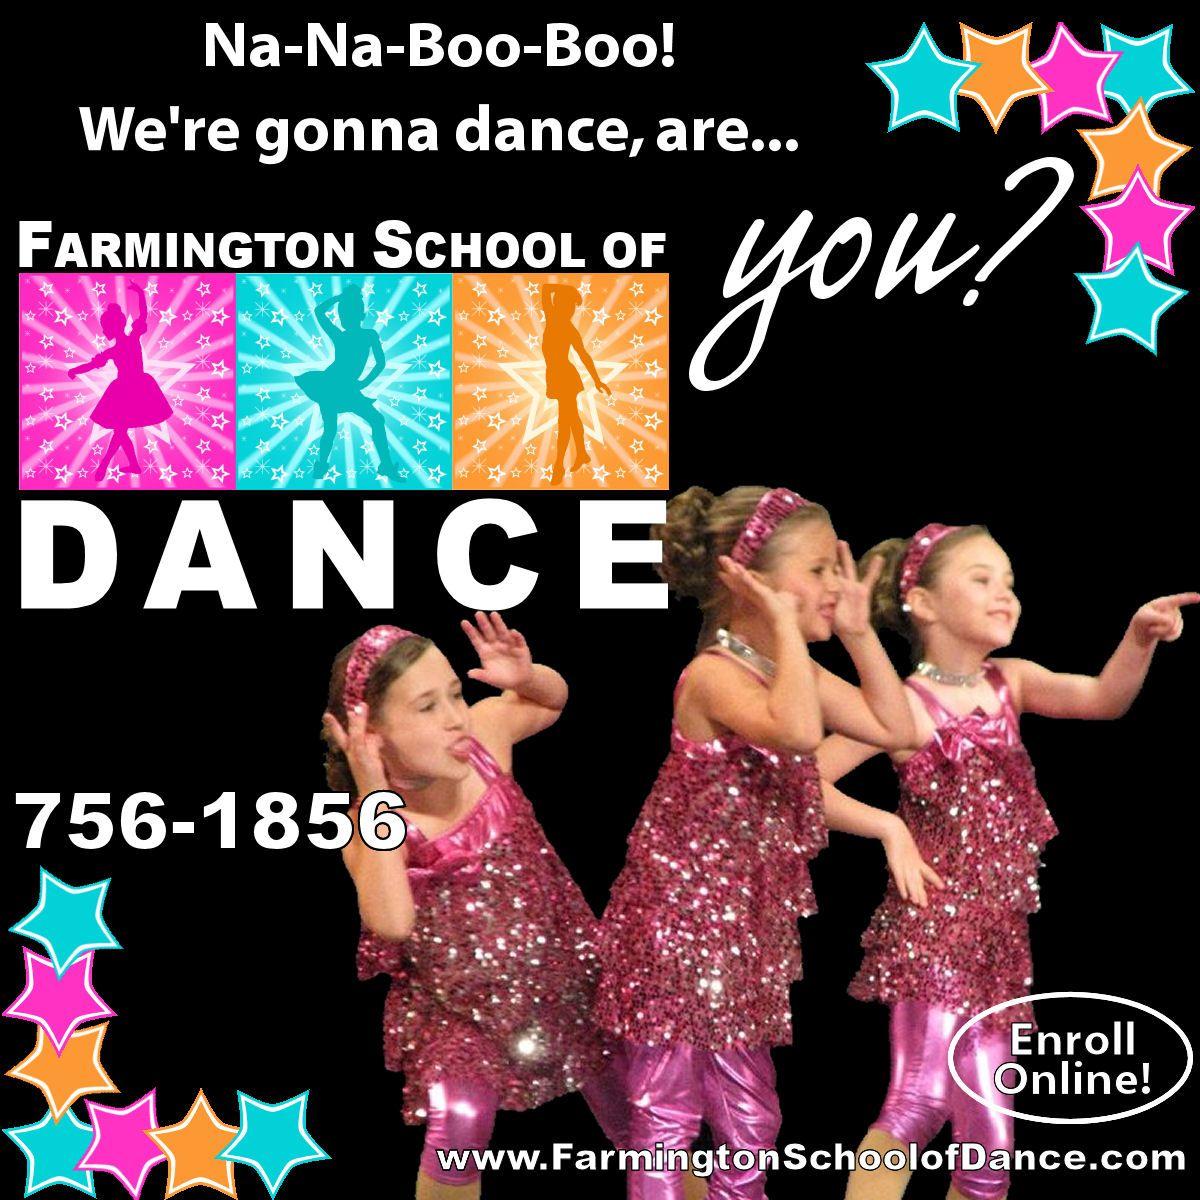 Pin By Farmington School Of Dance On Promotional Pictures Dance School Register Online